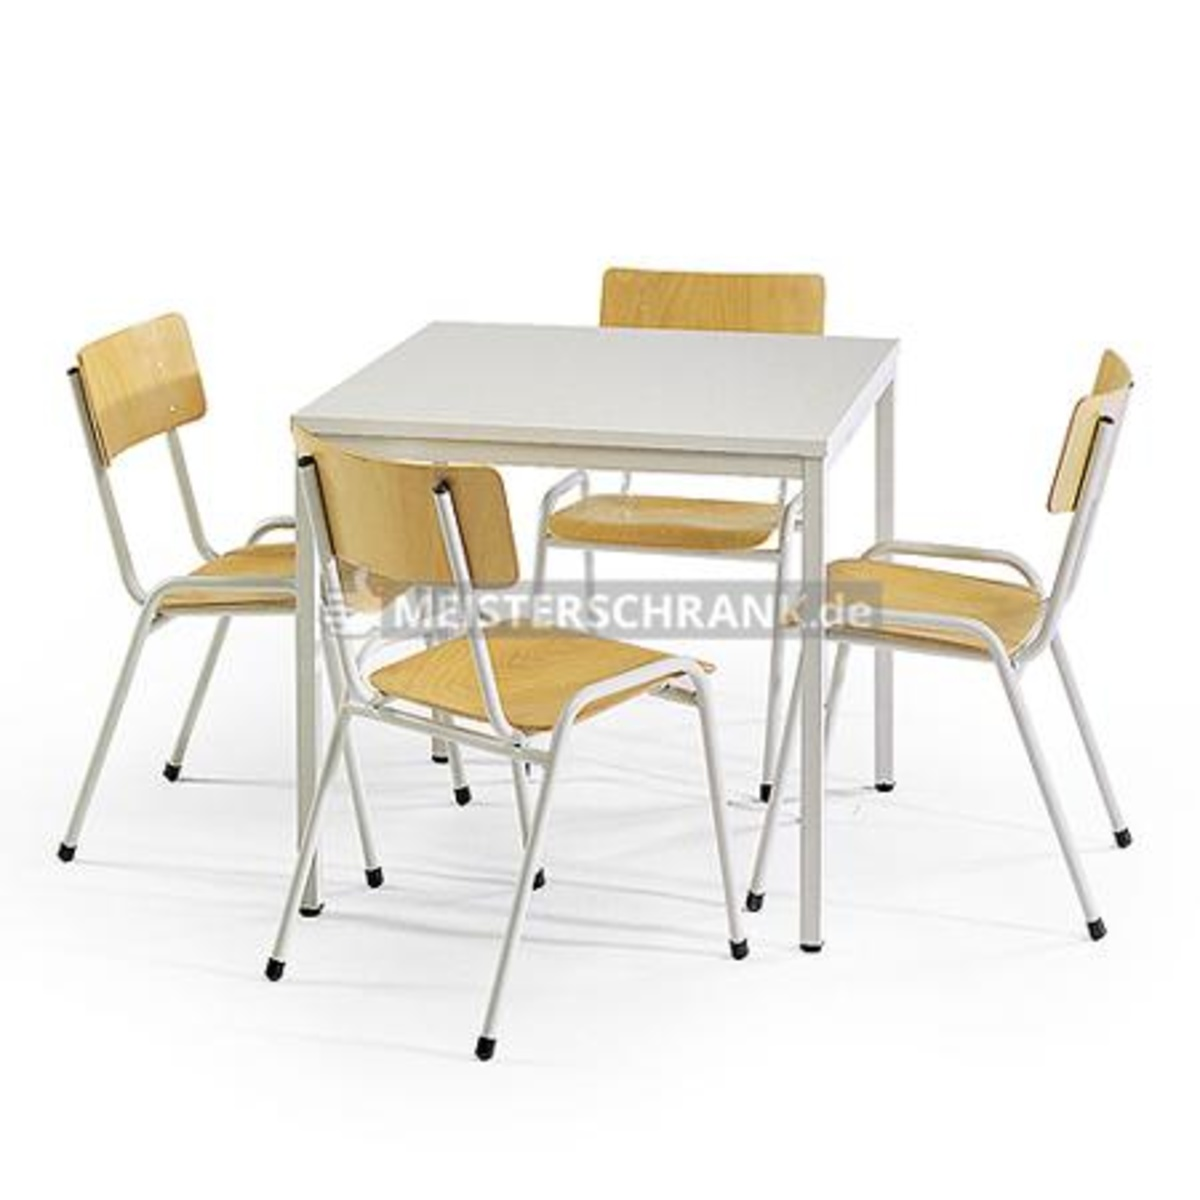 tisch stuhl kombination 1 eckiger tisch 800x800 mm 4 st hle der serie eco lichtgrau. Black Bedroom Furniture Sets. Home Design Ideas